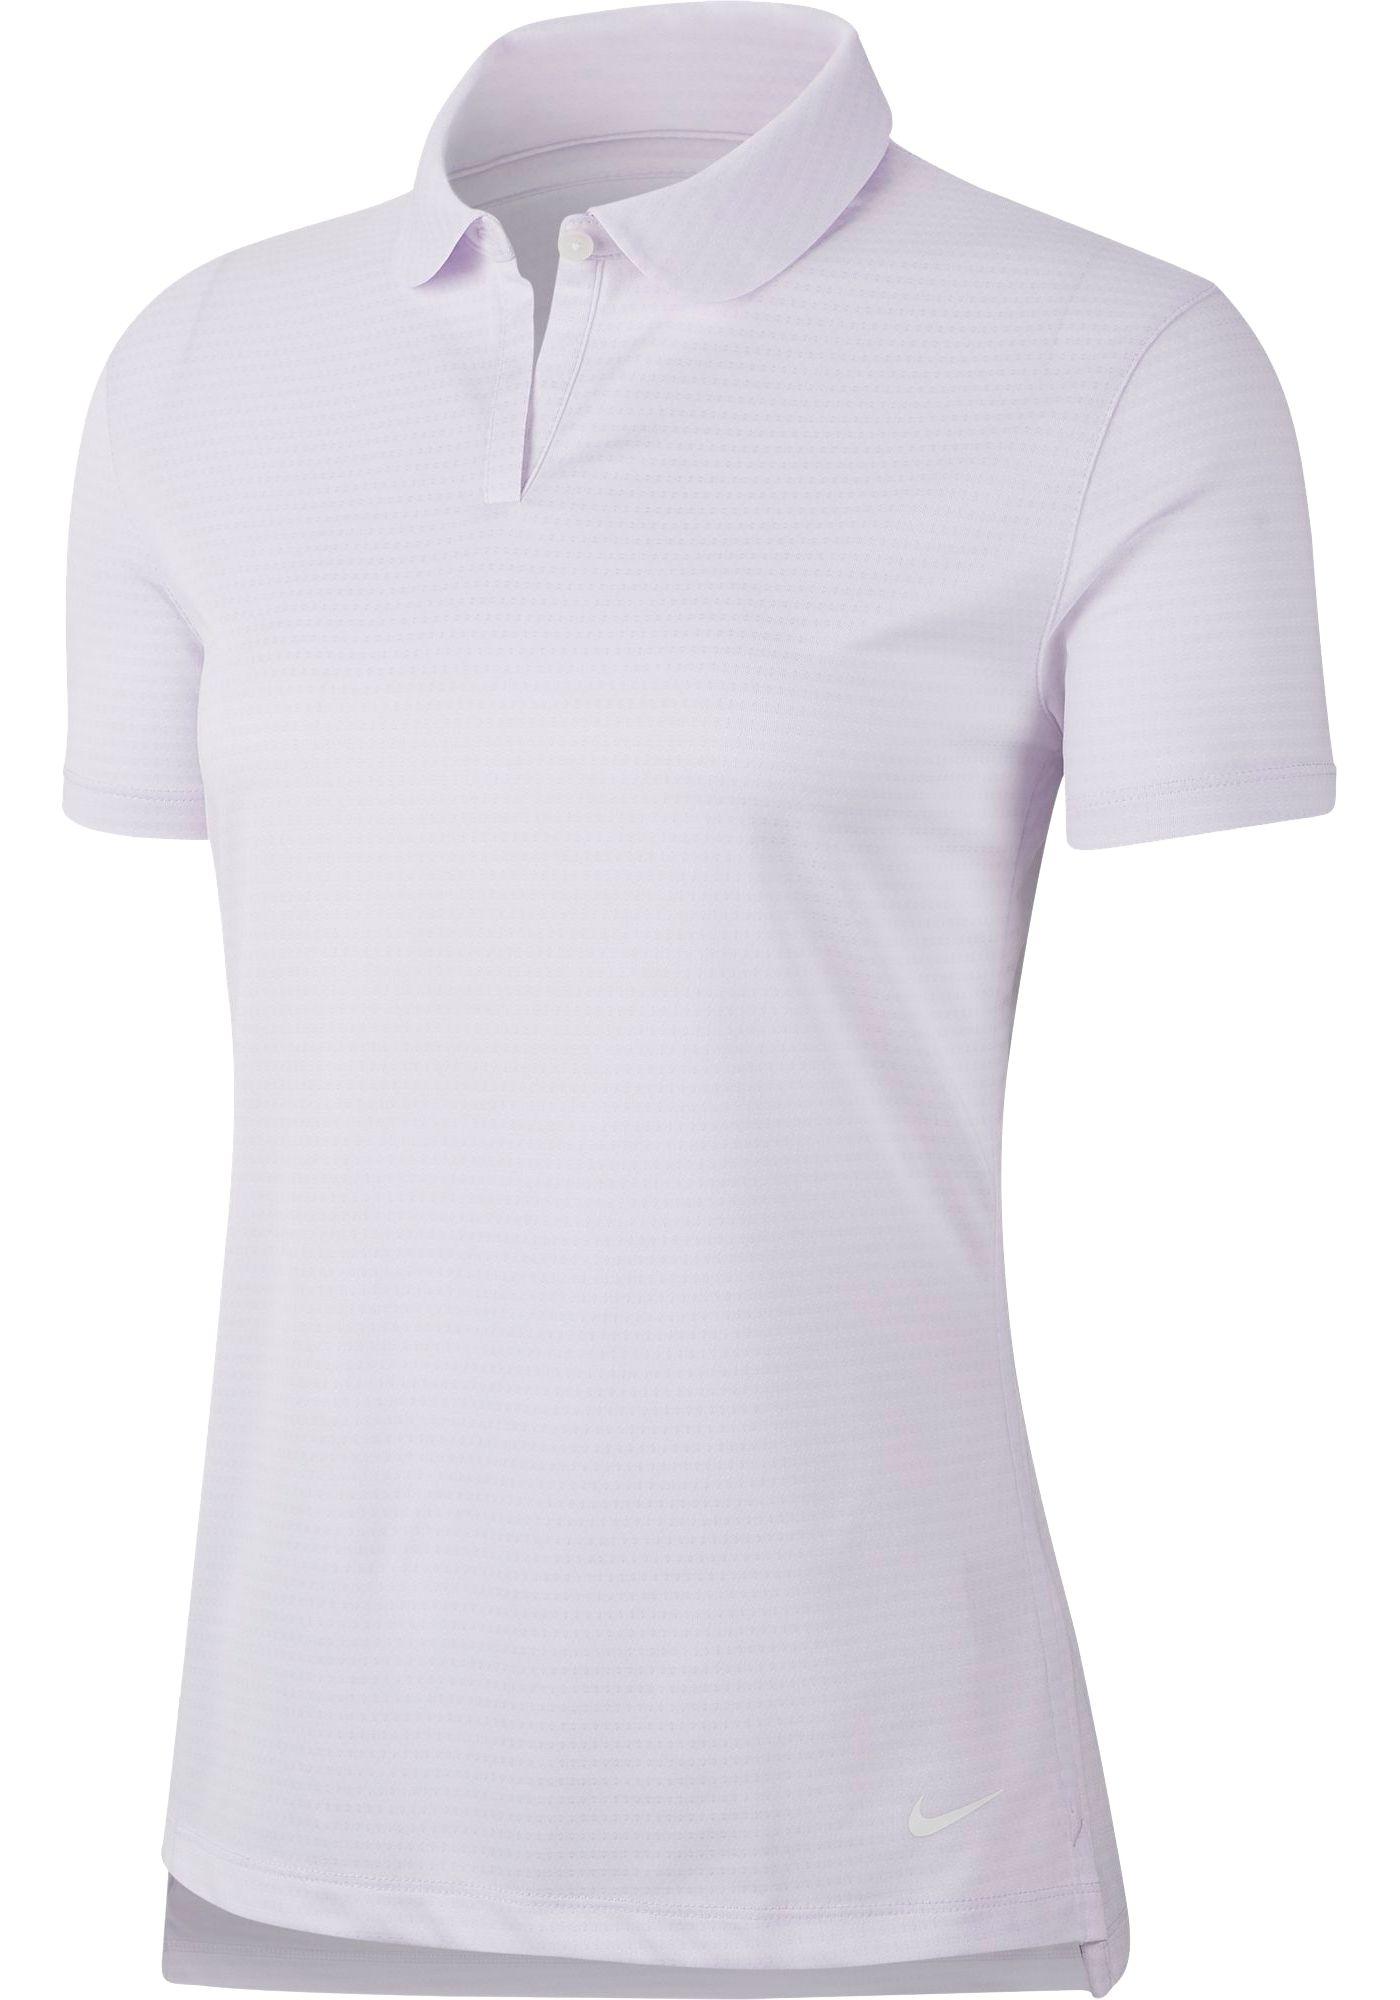 Nike Women's Dri-FIT Victory Short Sleeve Golf Polo